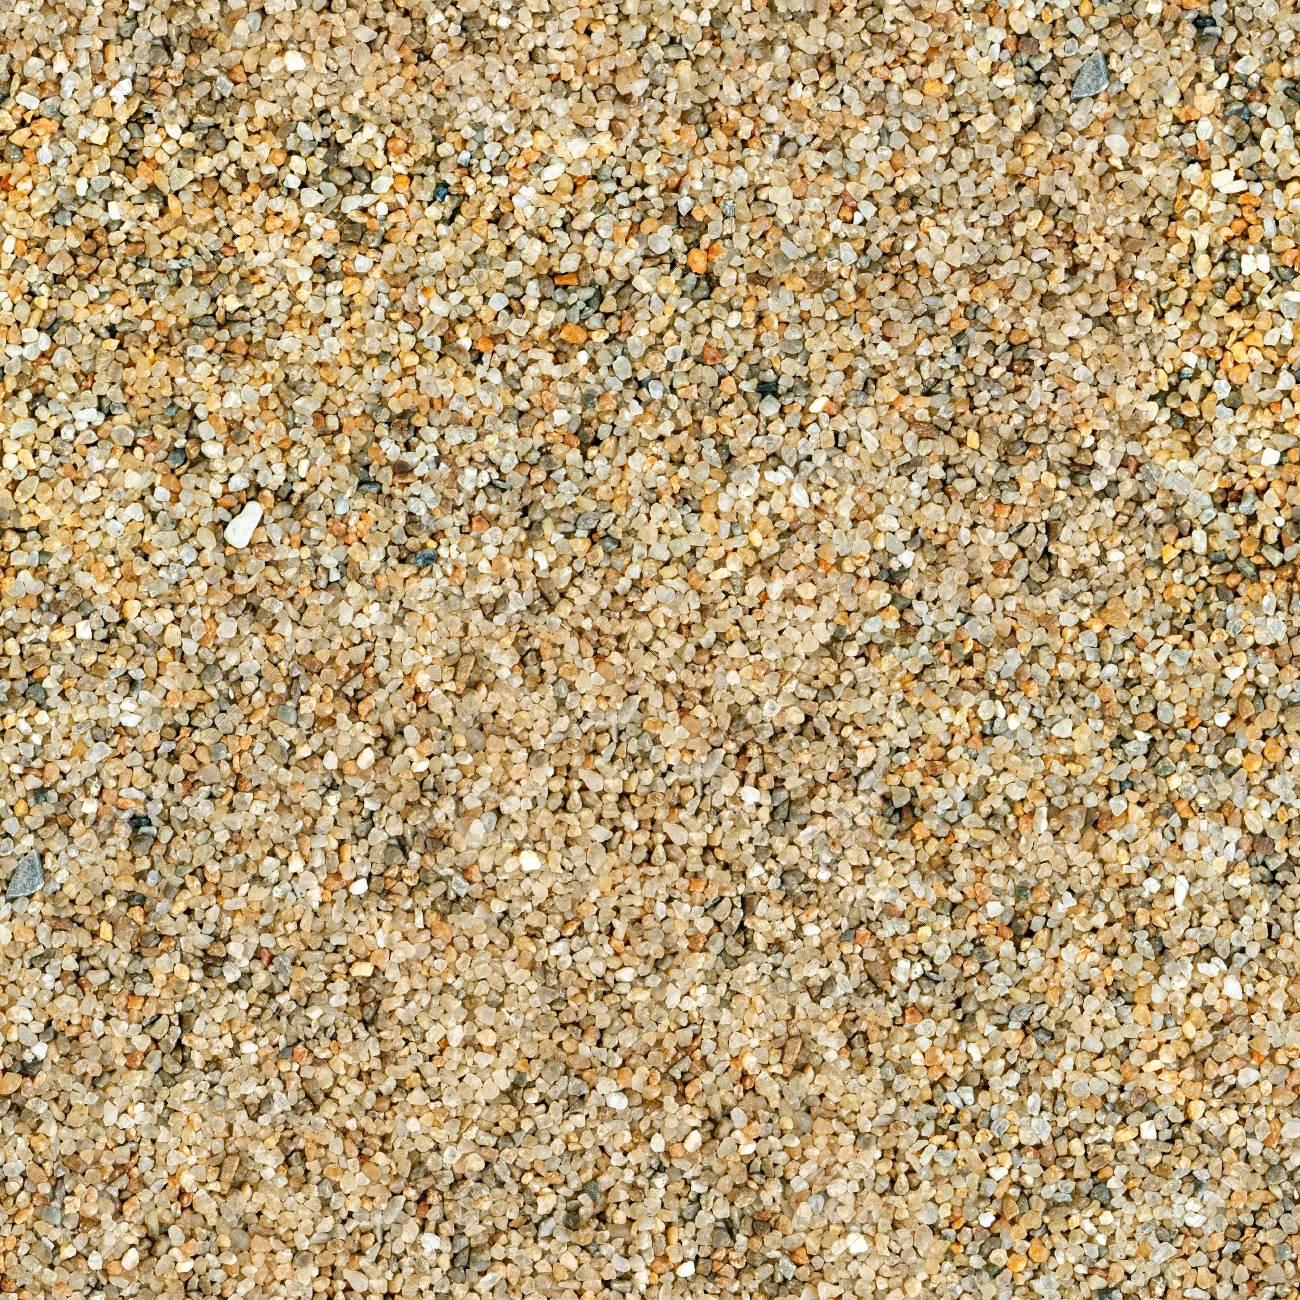 Quartz Sand Texture Seamless Square Texture Tile Ready Stock